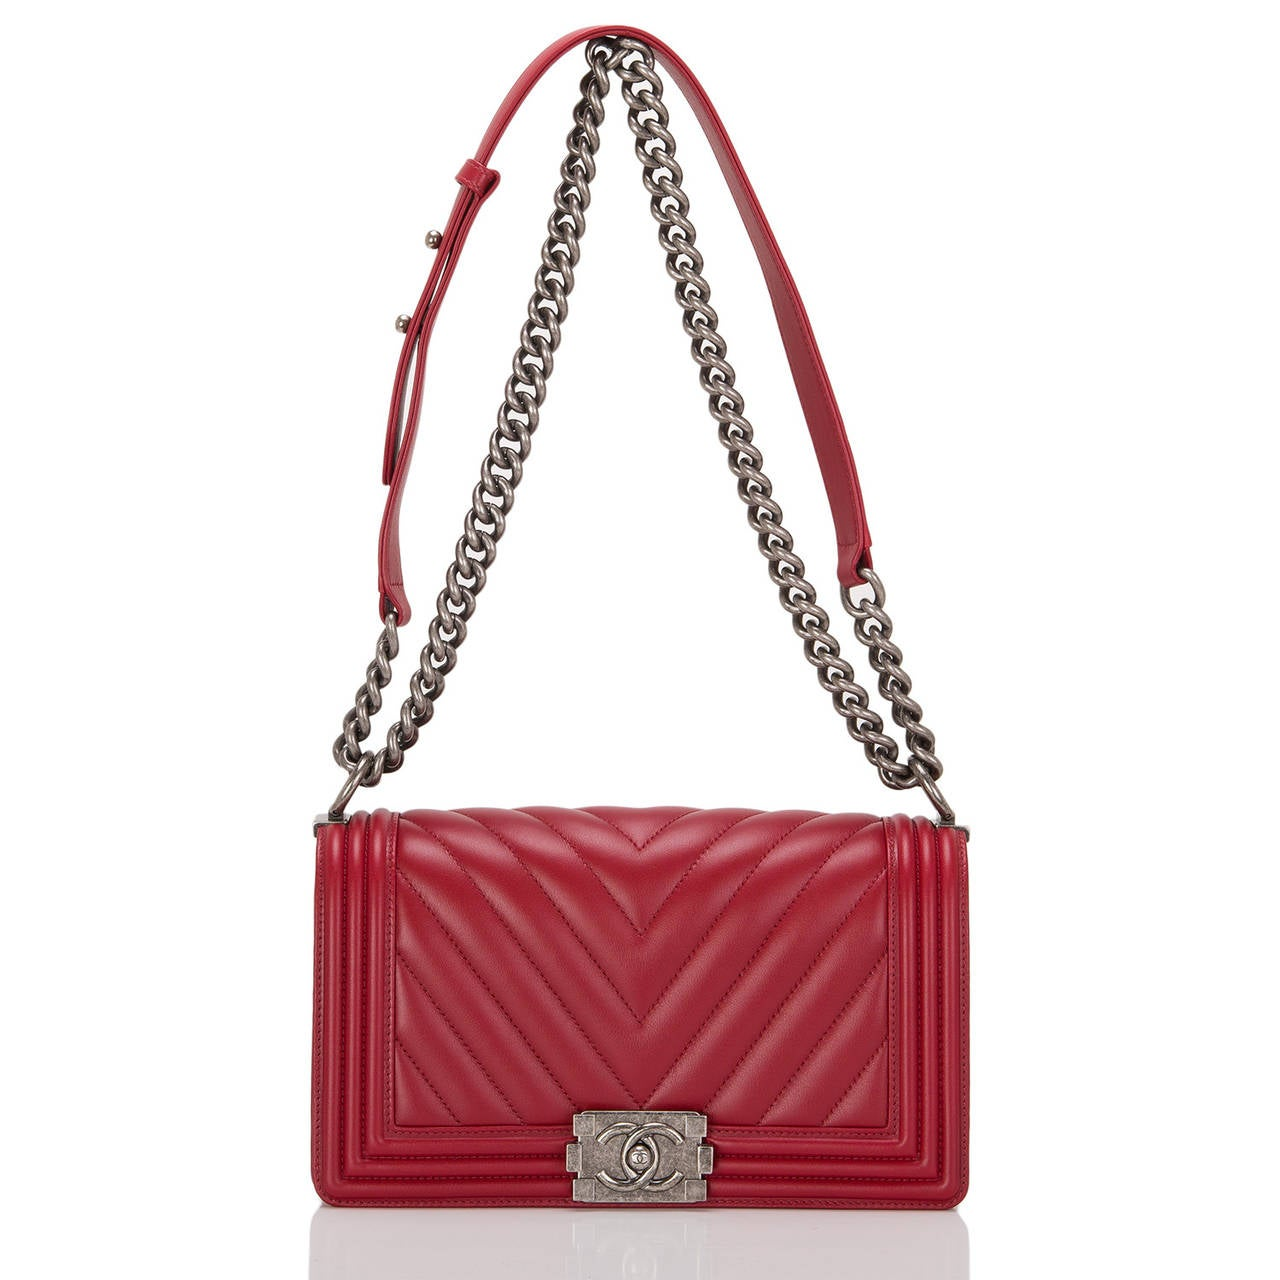 Chanel Red Chevron Medium Boy Bag For Sale 1